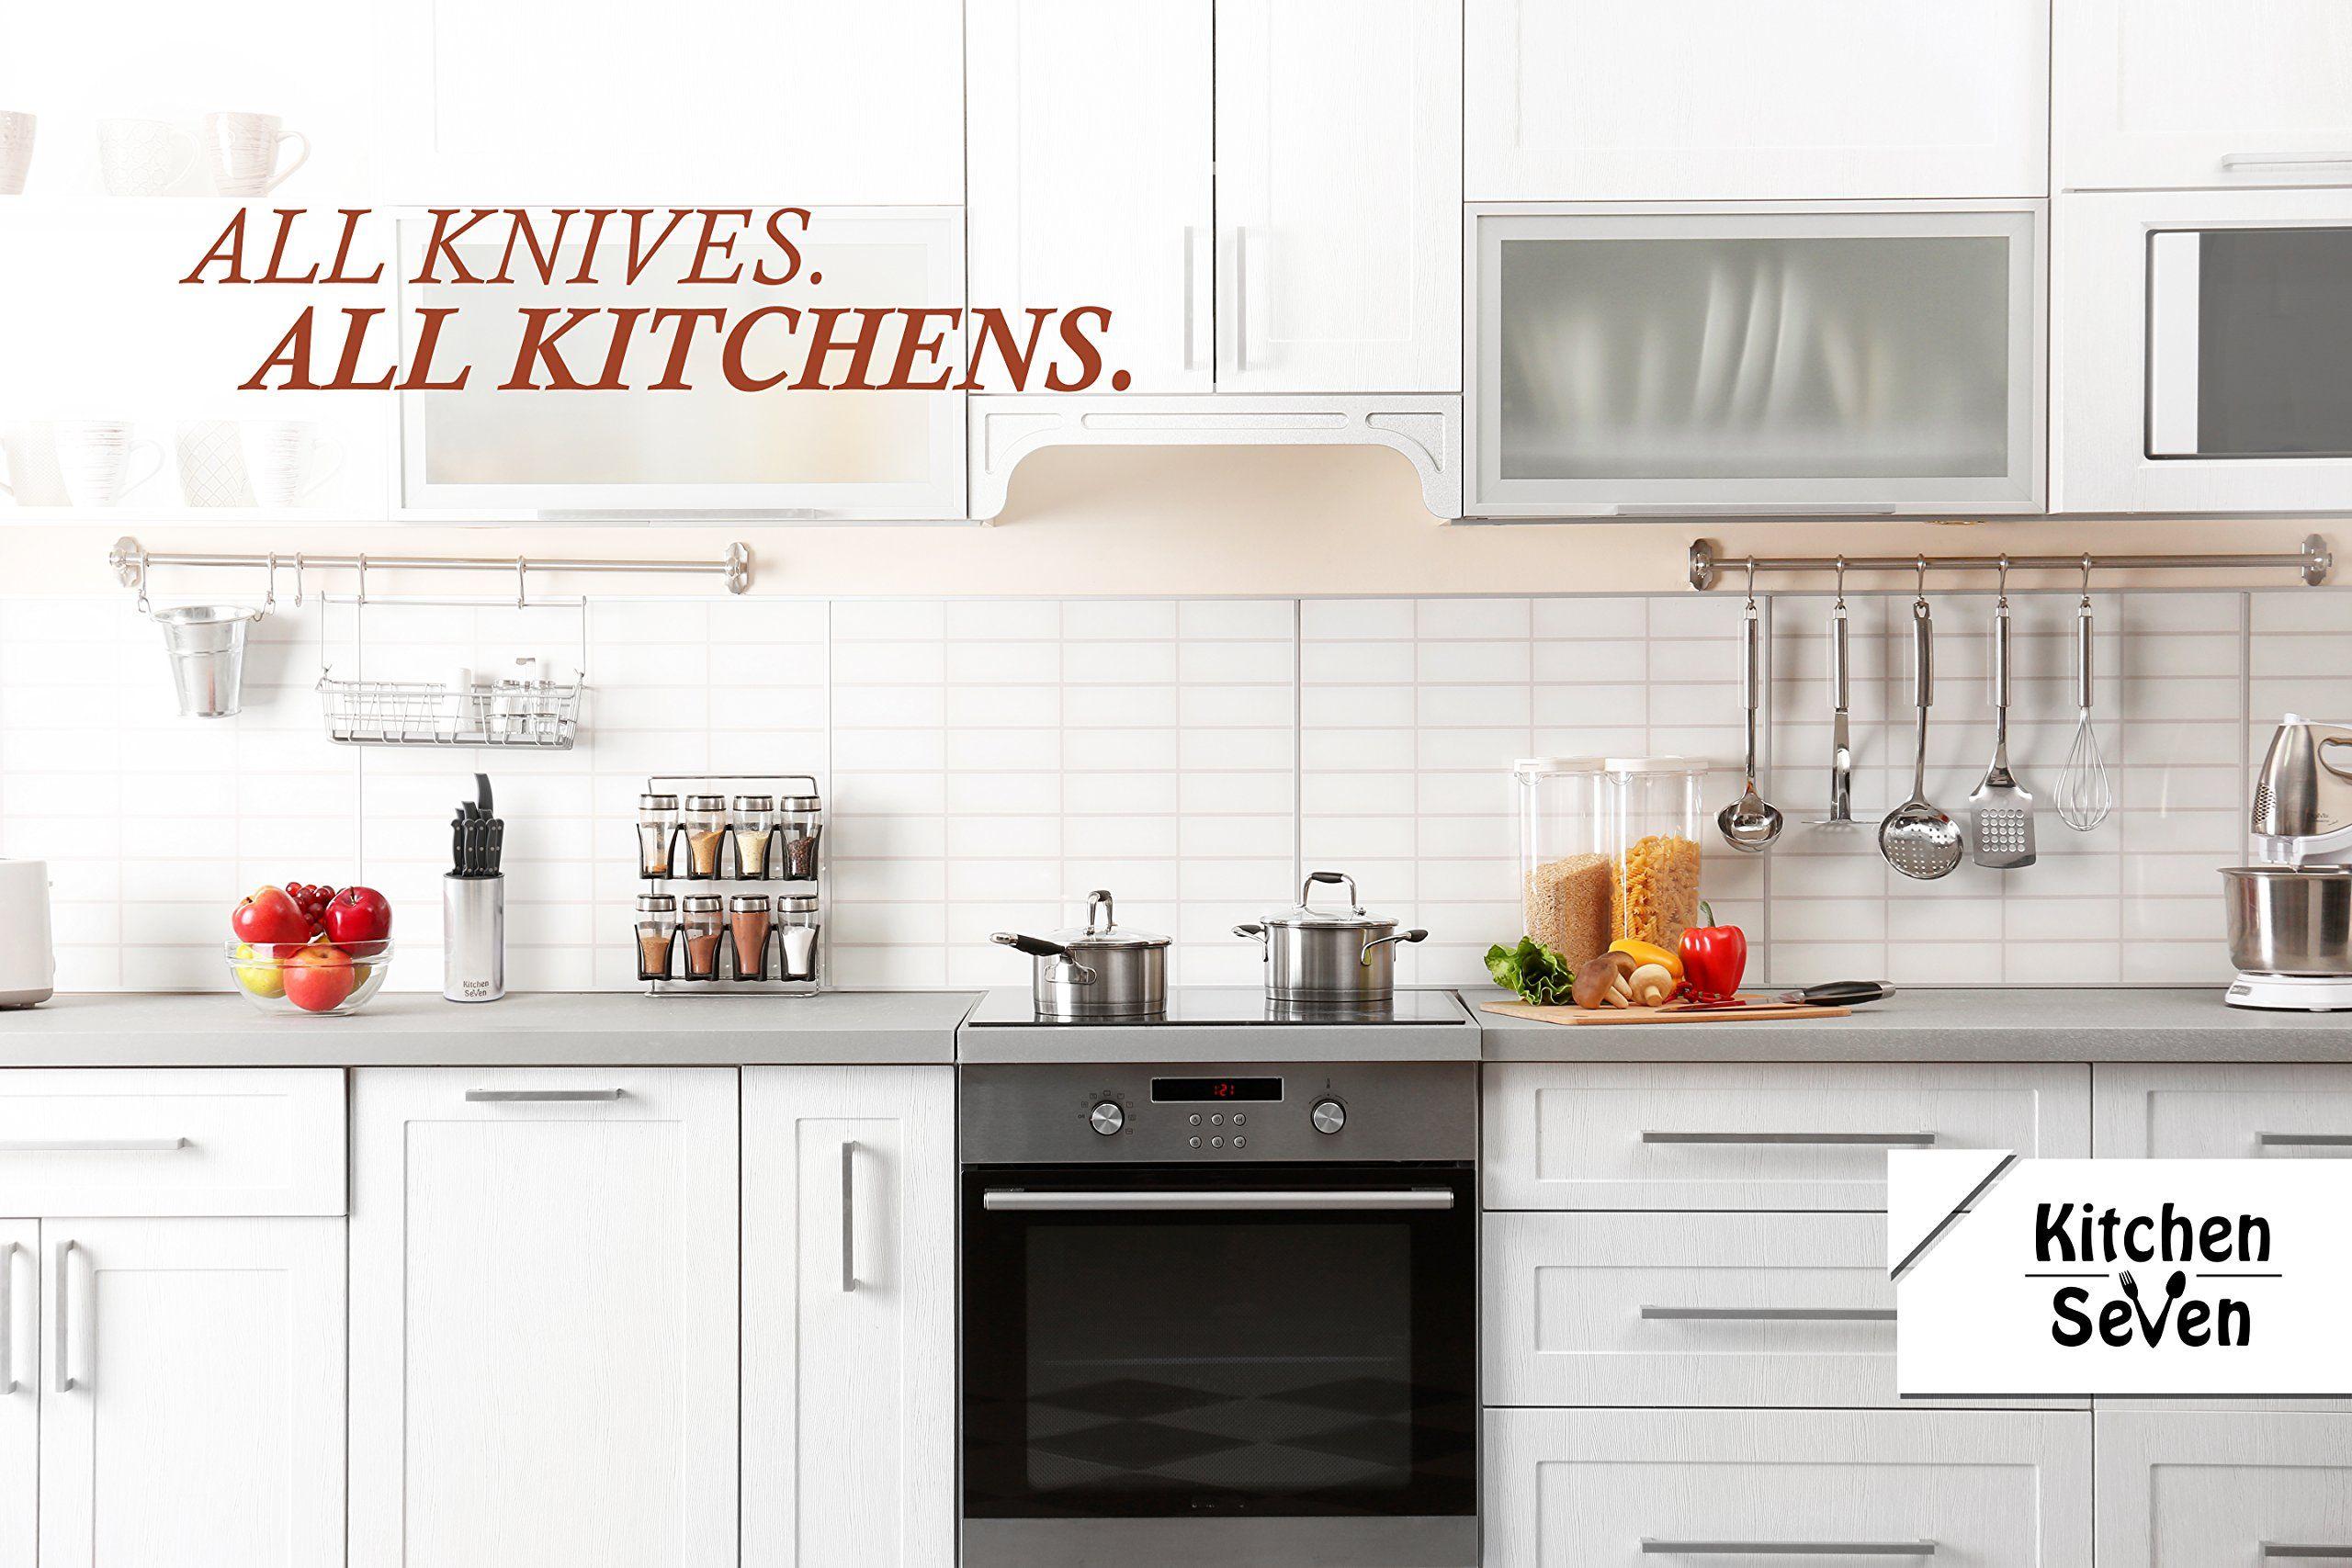 Kitchen Seven Premium Chef Universal Knife Block Stainless Steel Kitchen Knife Holderwithout Knives Kitchen Cabinets Modern Kitchen Interiors Kitchen Remodel